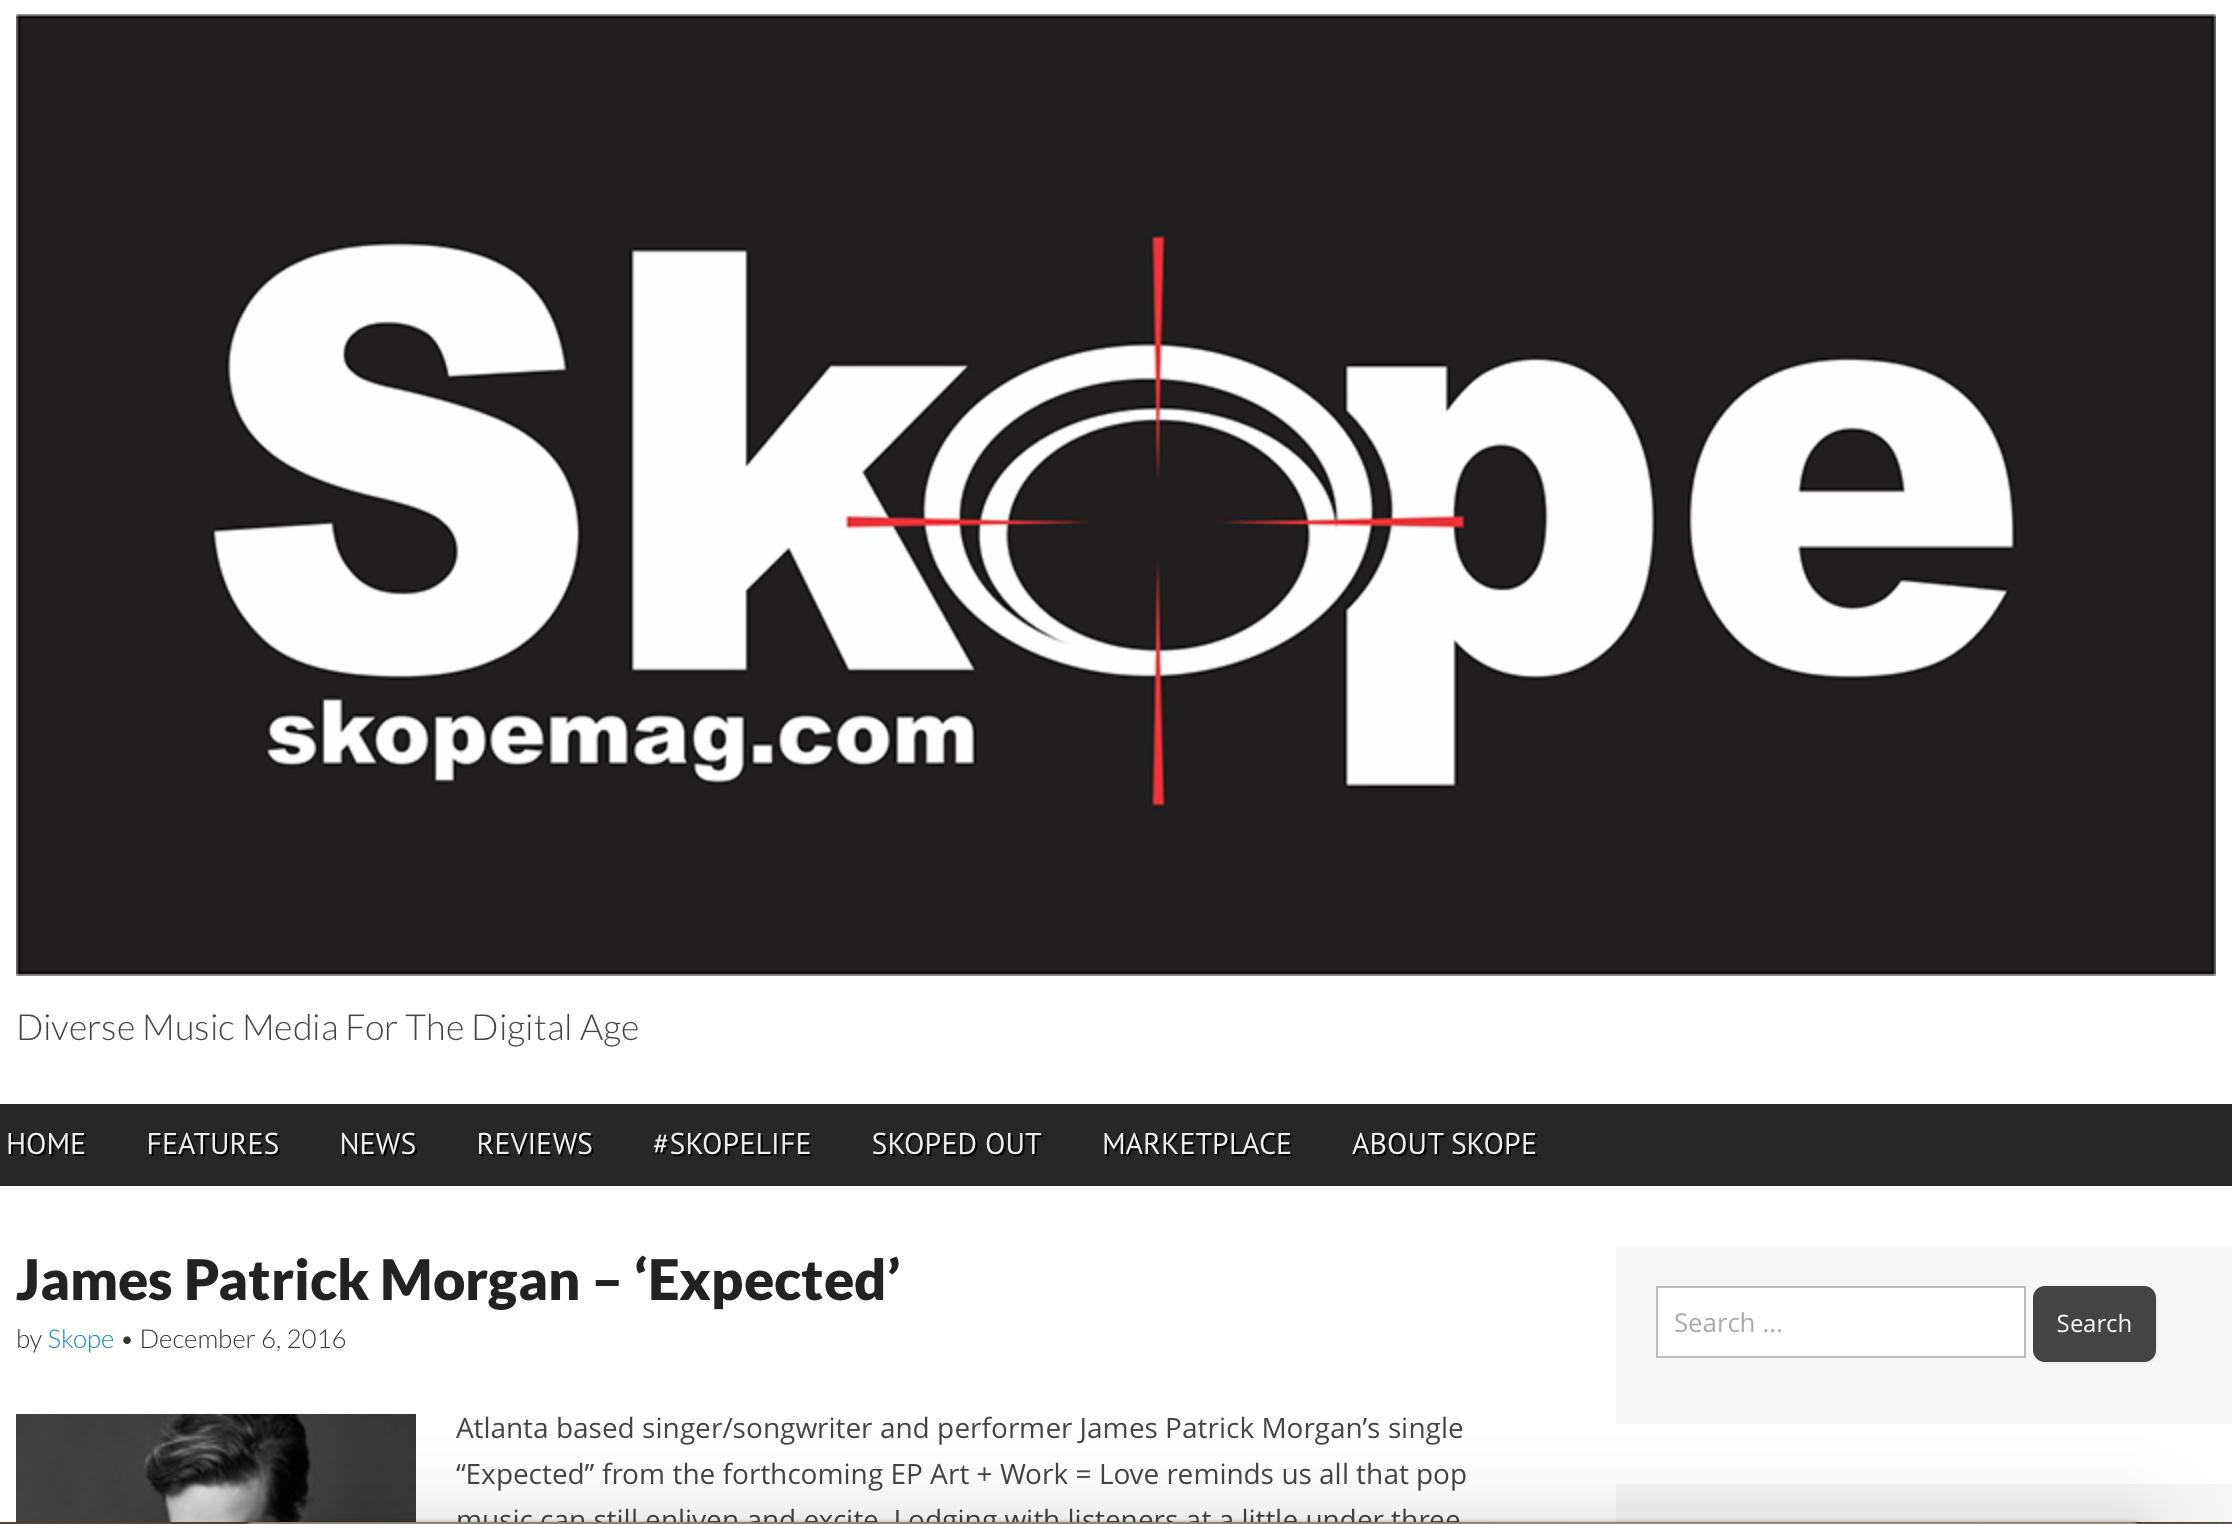 JPM-SkopeMagazine.png